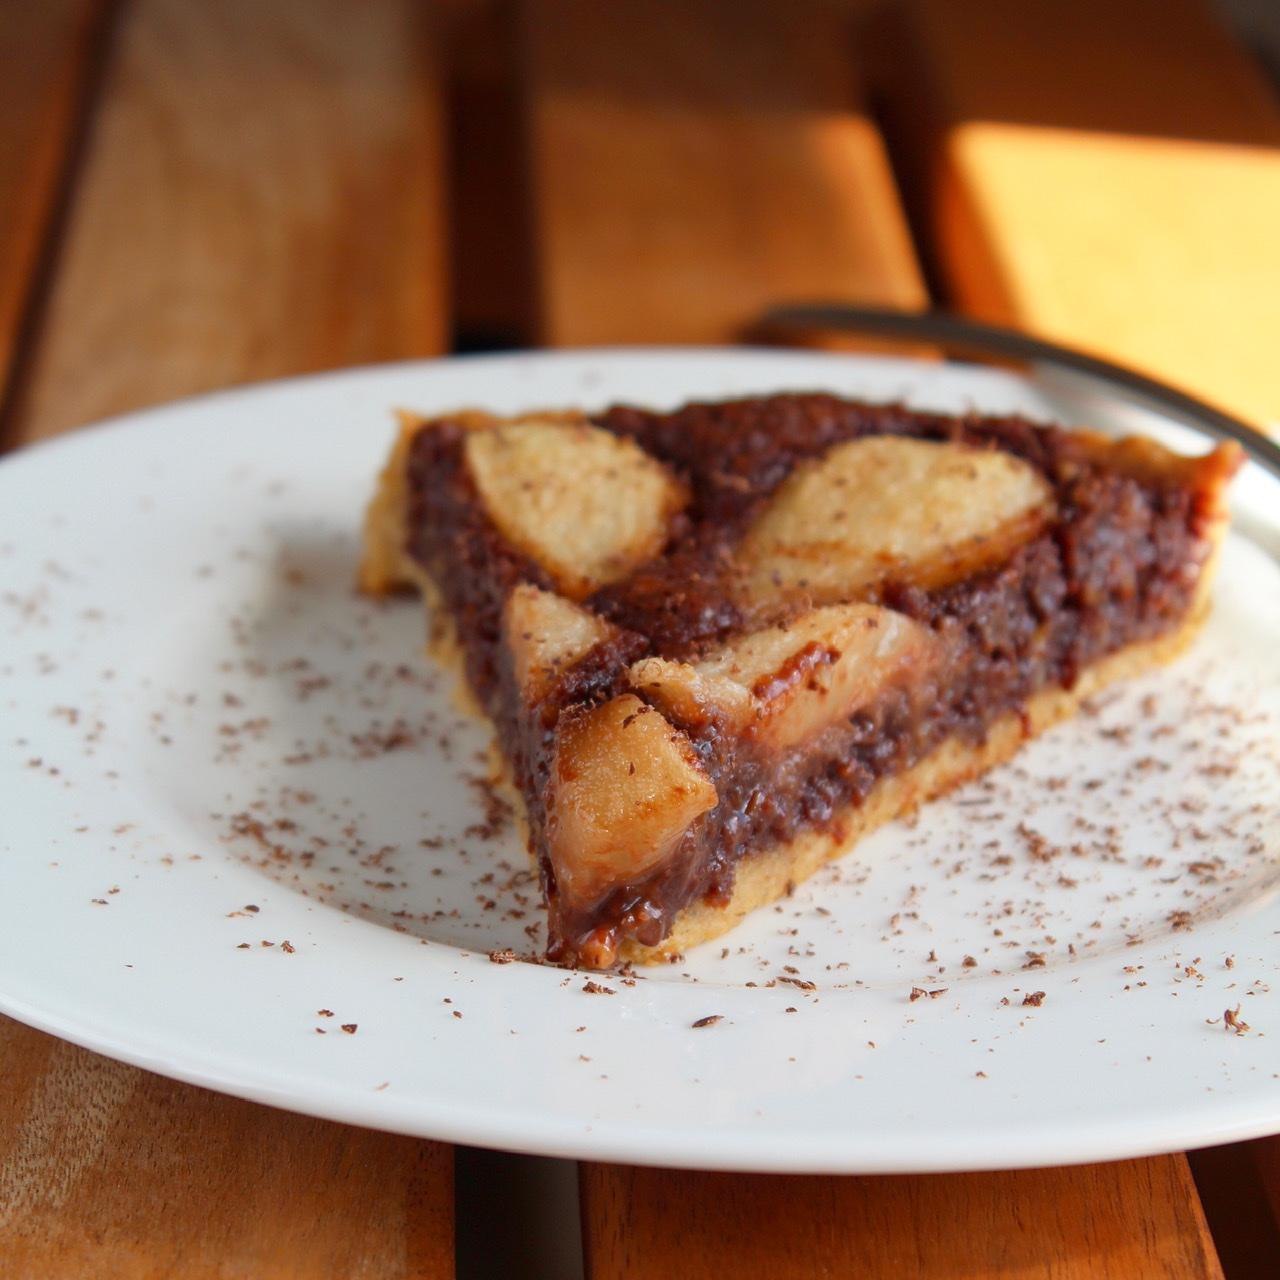 Pear and Chocolate Tart Buckwheat Queen